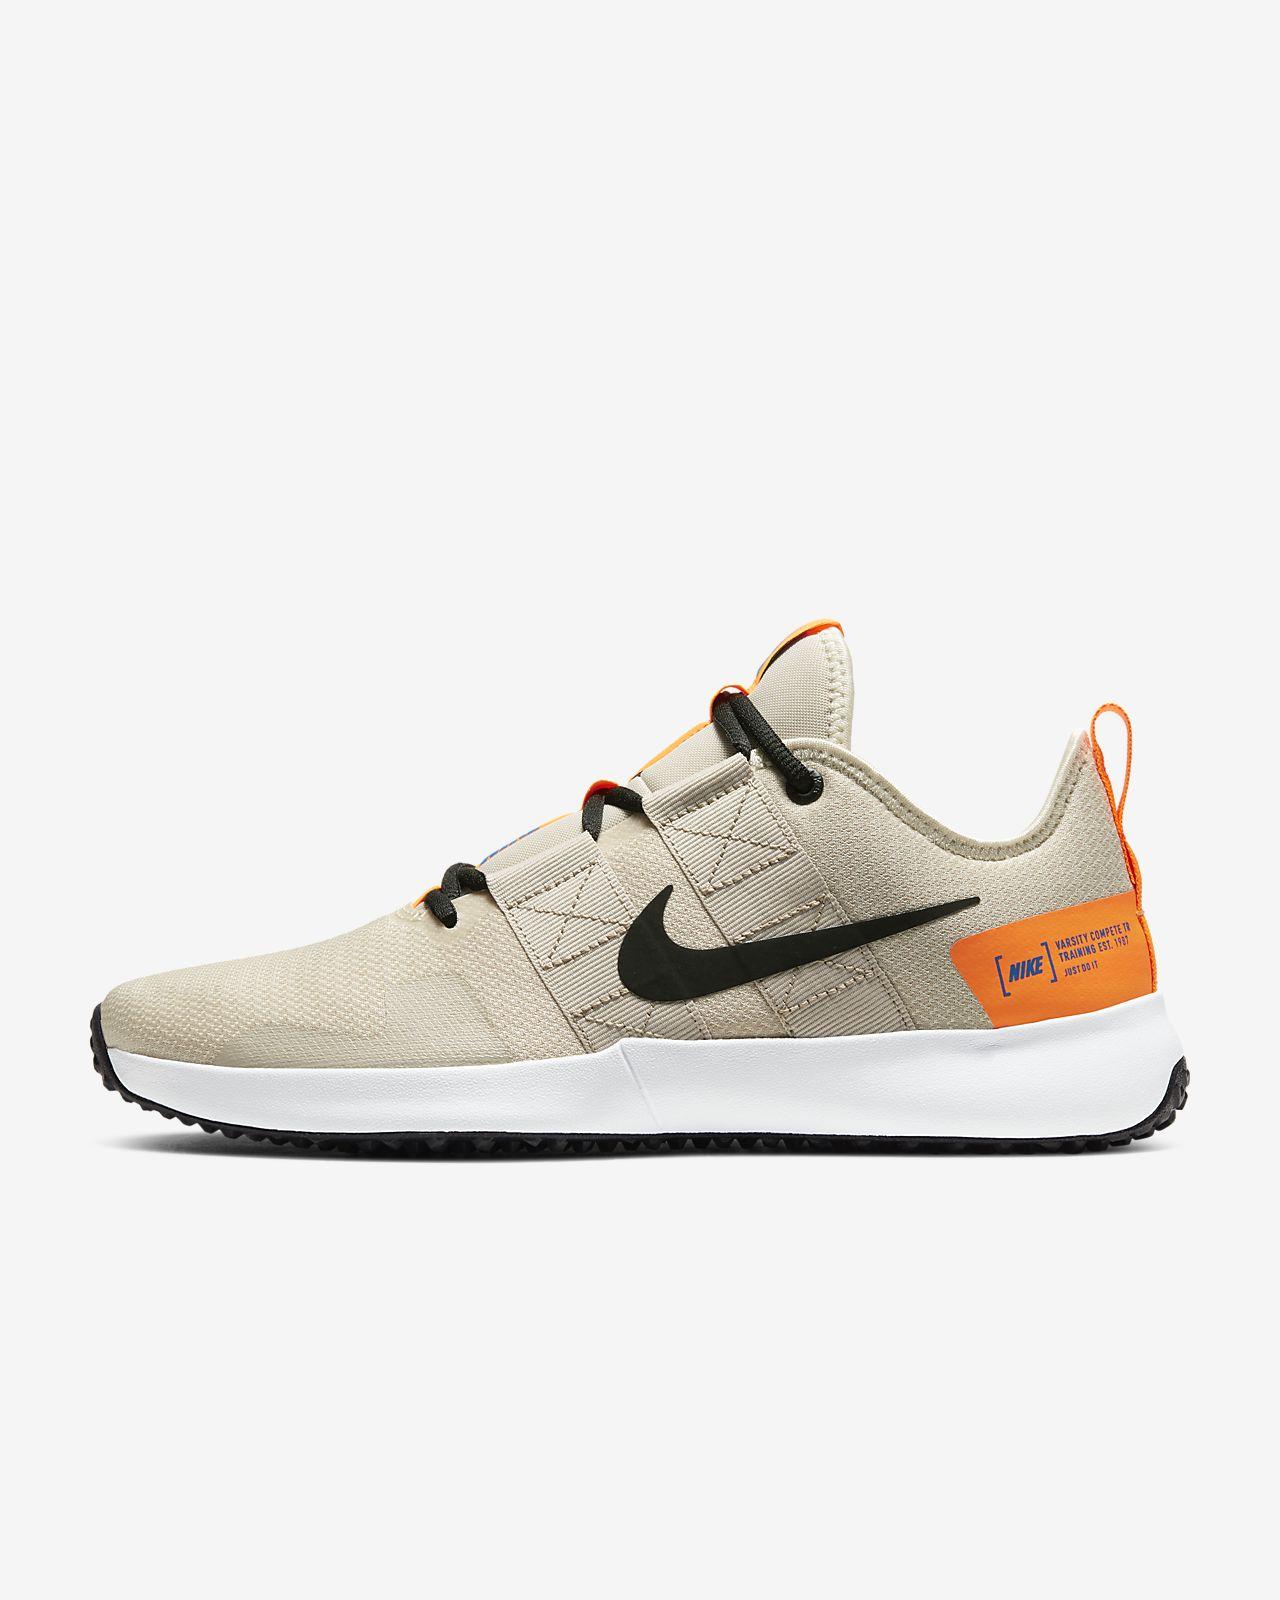 Homens Nike Sapatilhas Portugal